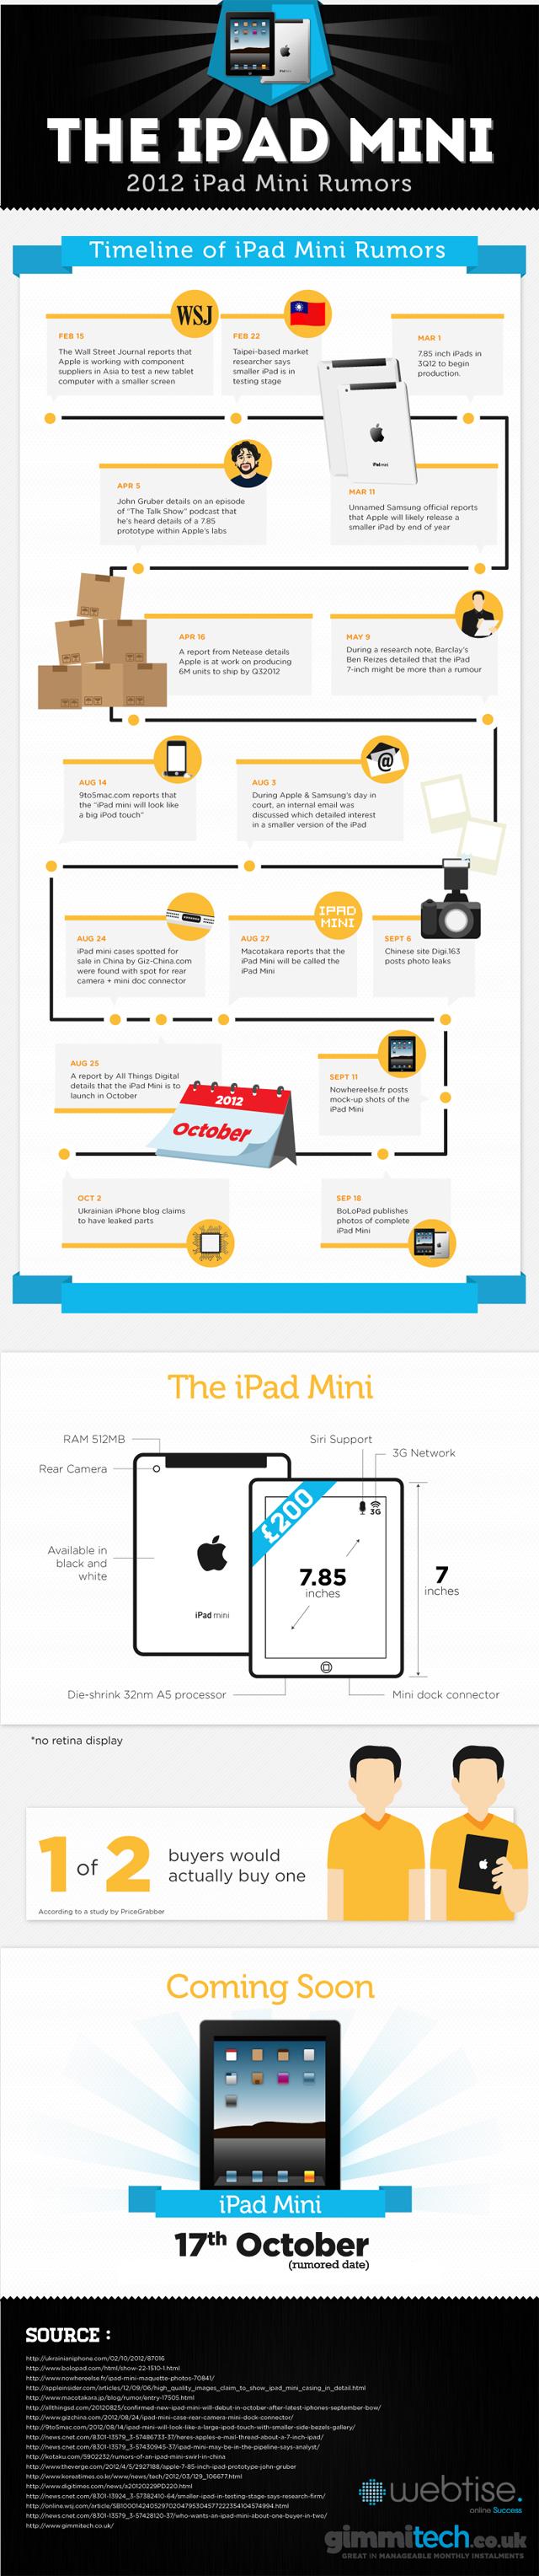 Infográfico com os rumores do iPad mini